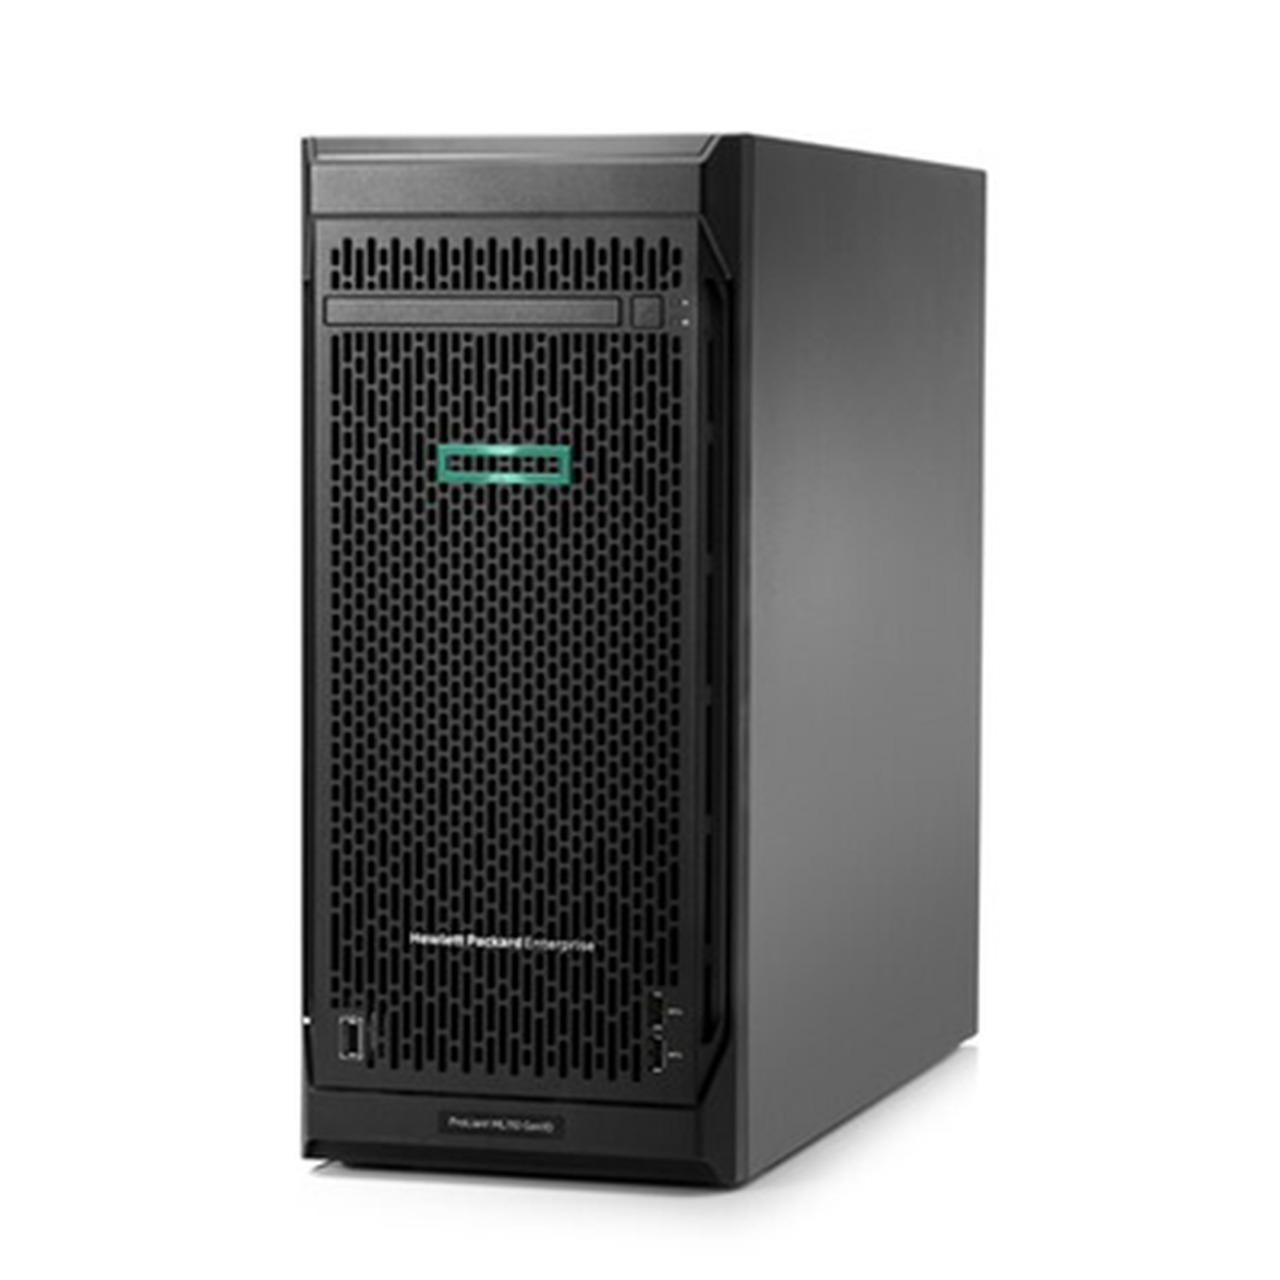 Tower/HP Enterprise: ML350, GEN10, with, 4210R, 10, core, processor, 16gb, 8SFF, drive, bays,